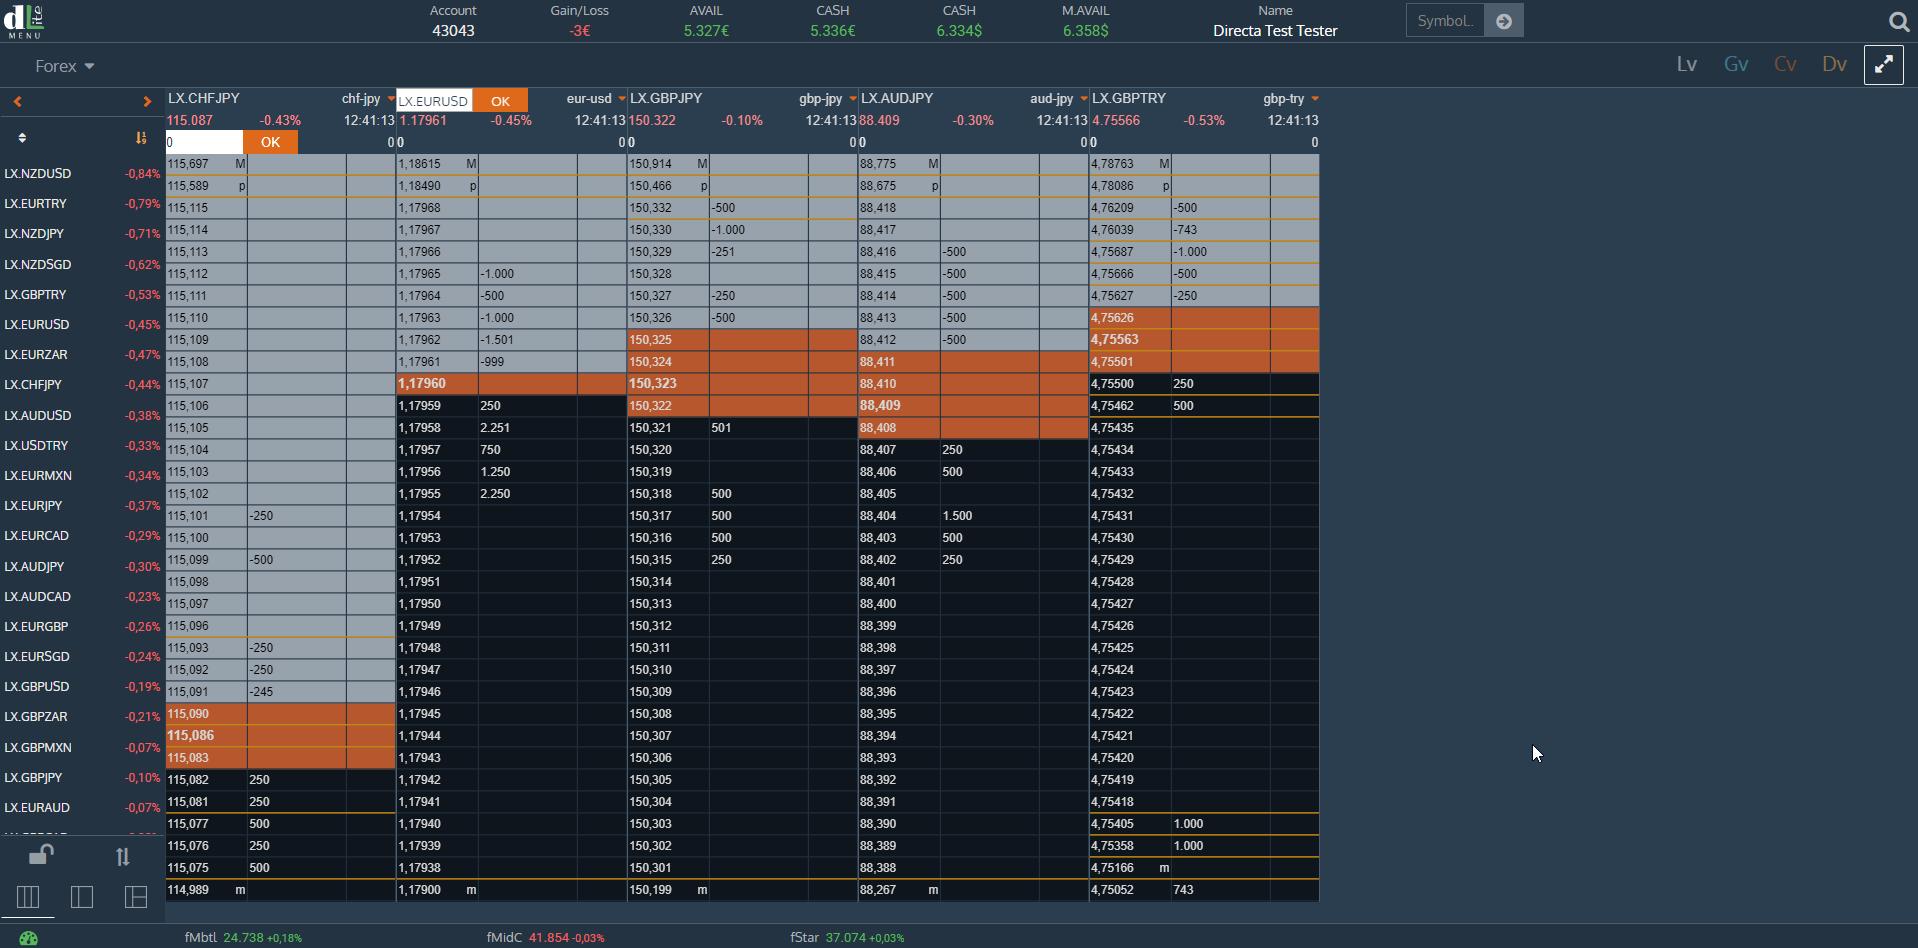 dLite | Online Web Trading Platform -Directa